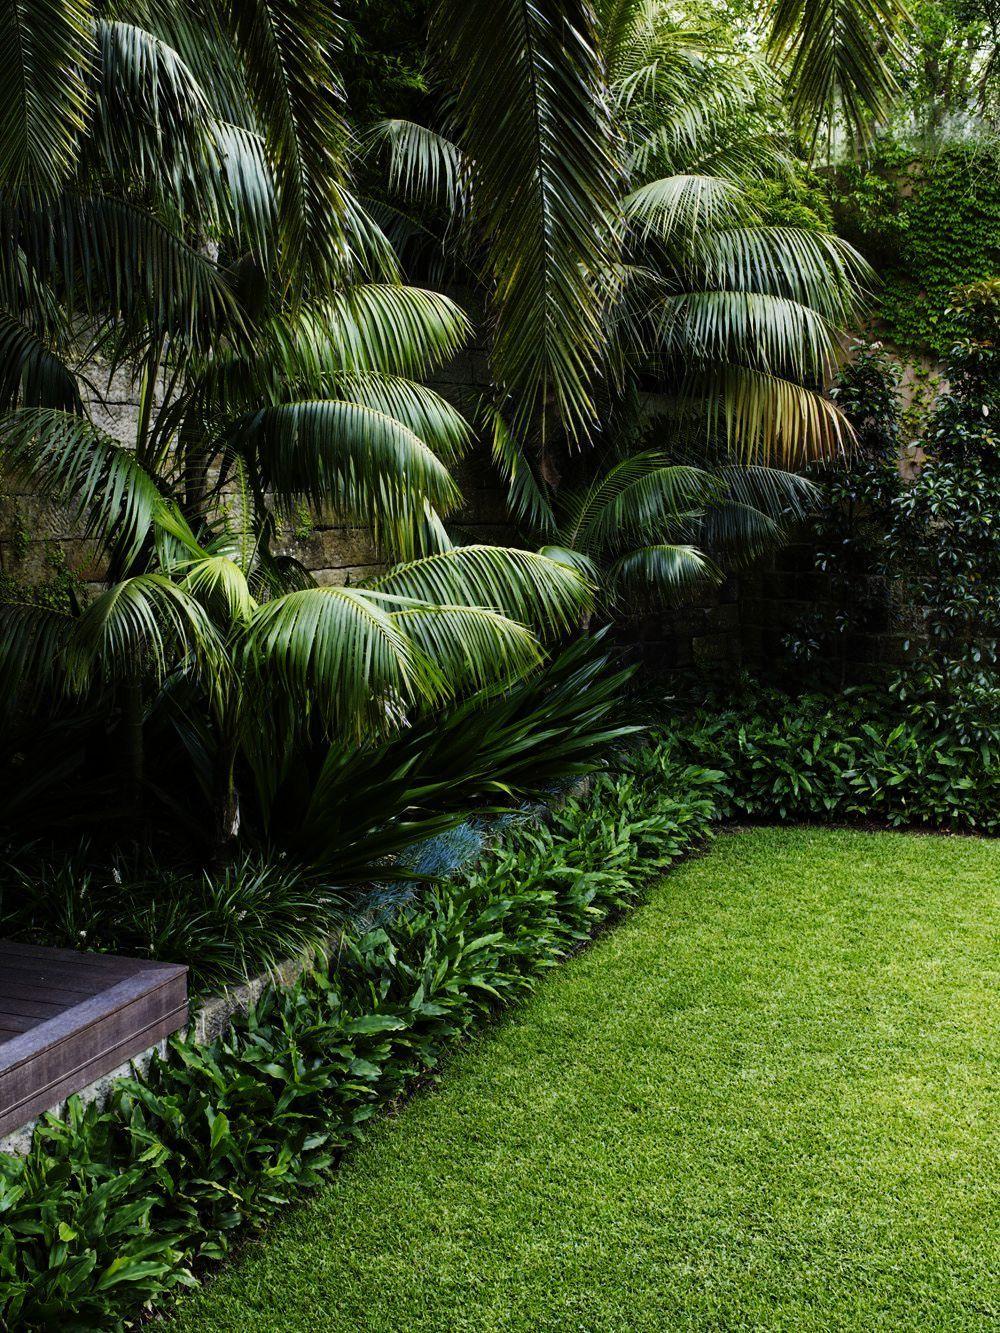 Landscape Gardening Jobs New Zealand One Landscape Gardening Evening Course Abov Front Garden Landscape Tropical Landscape Design Tropical Garden Design